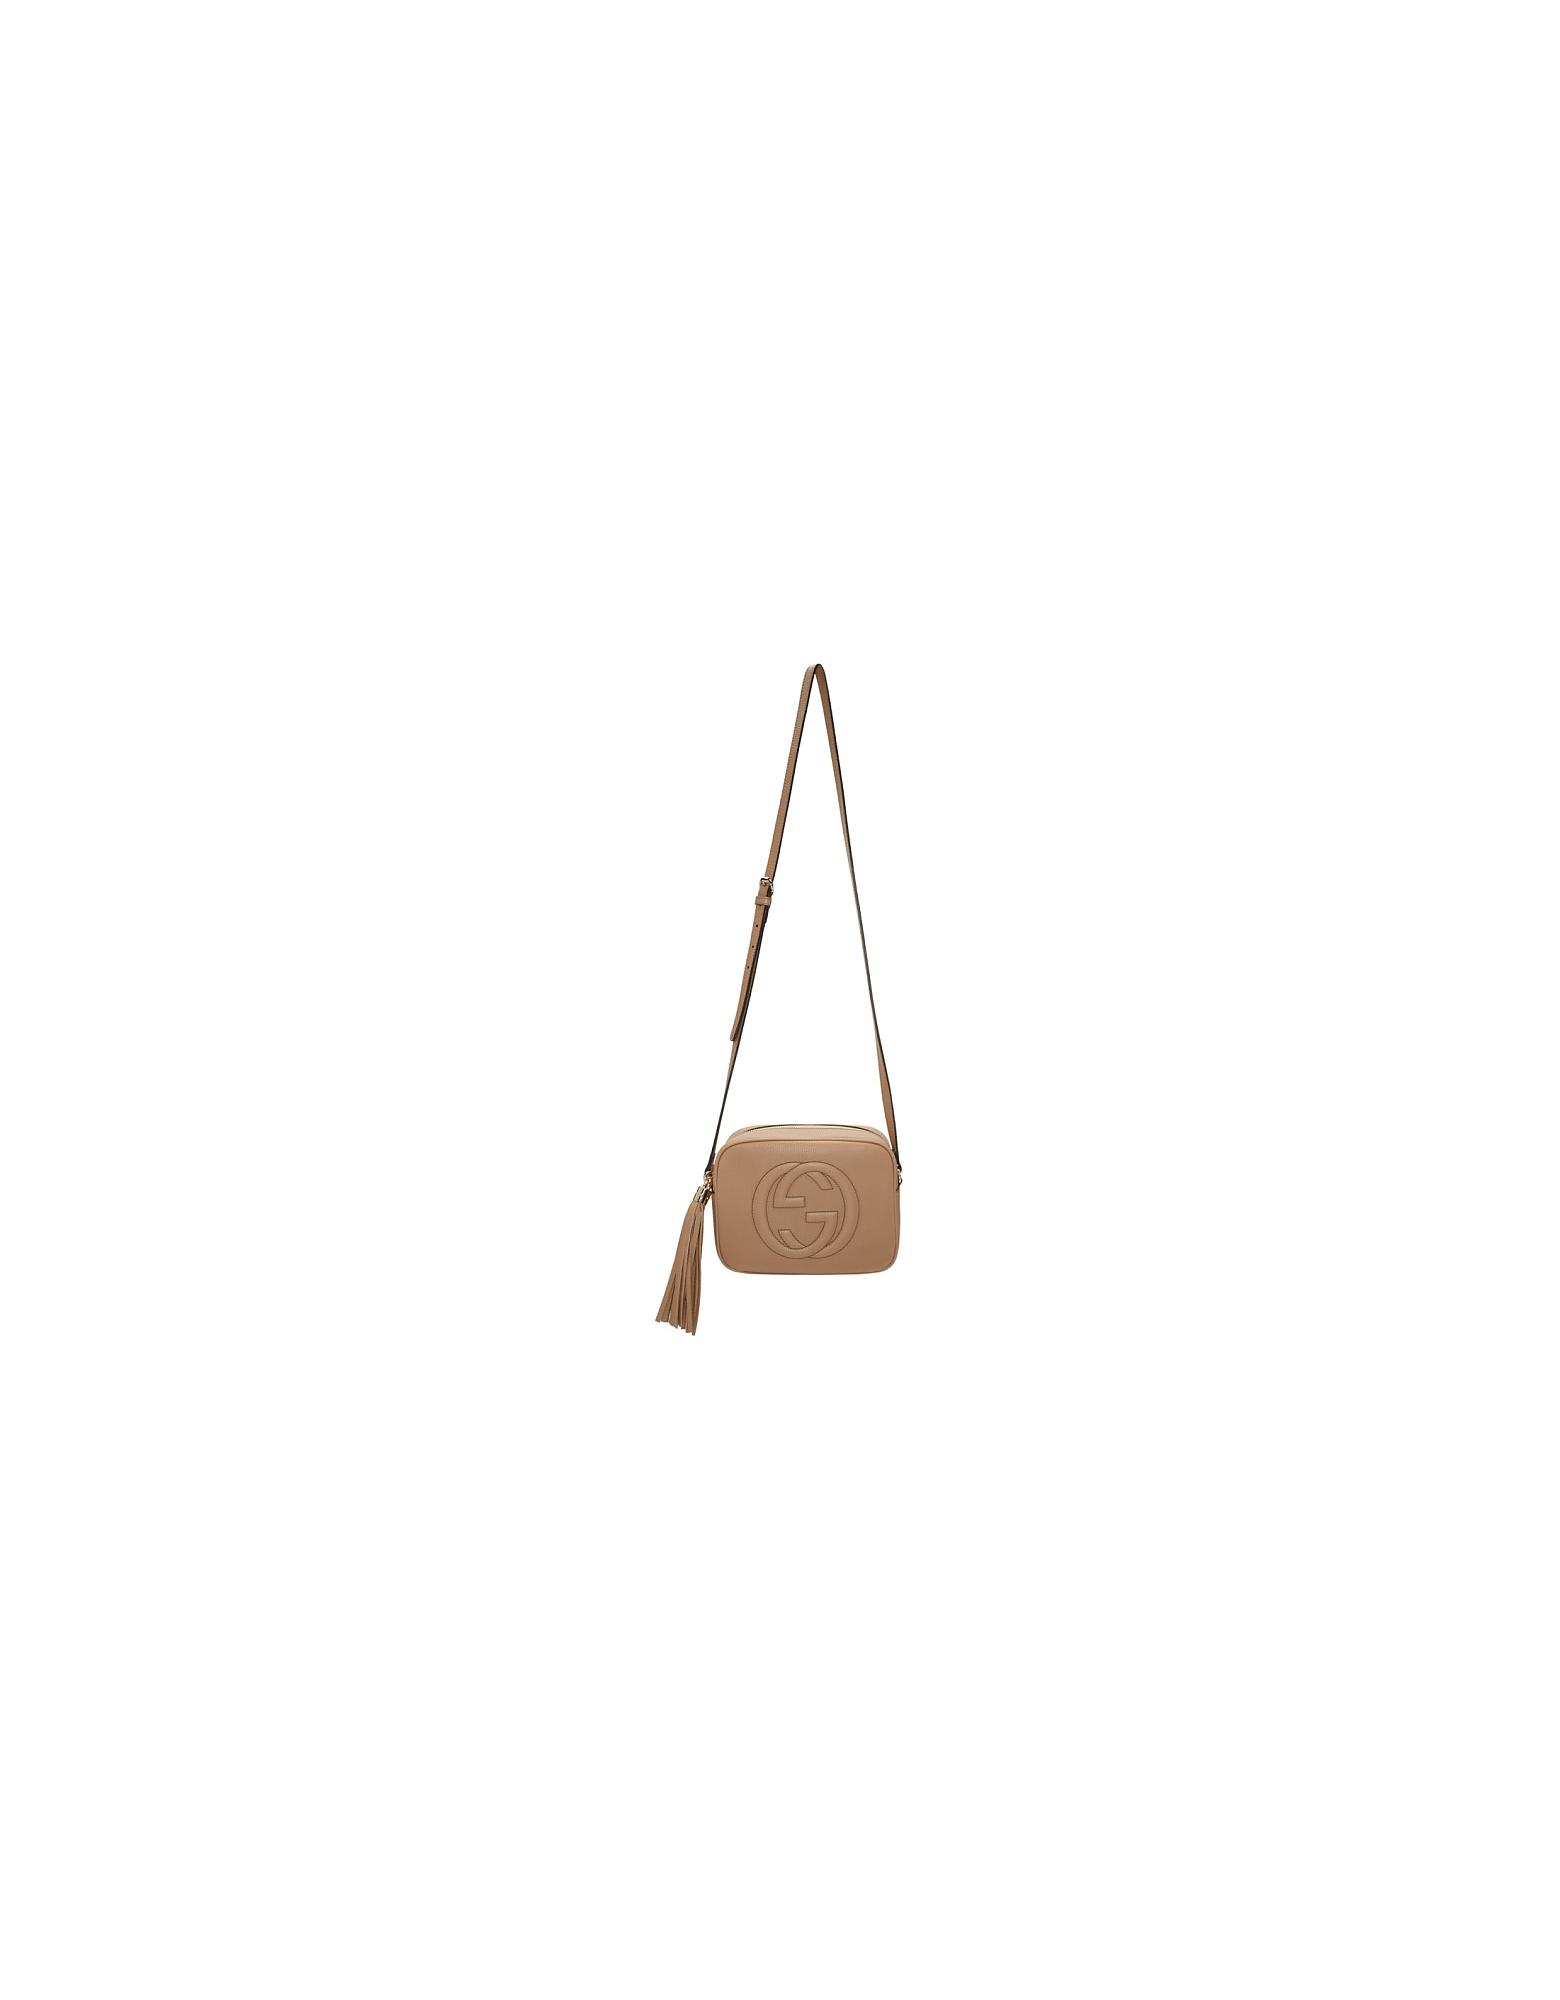 Gucci Designer Handbags, Tan Small Soho Disco Bag